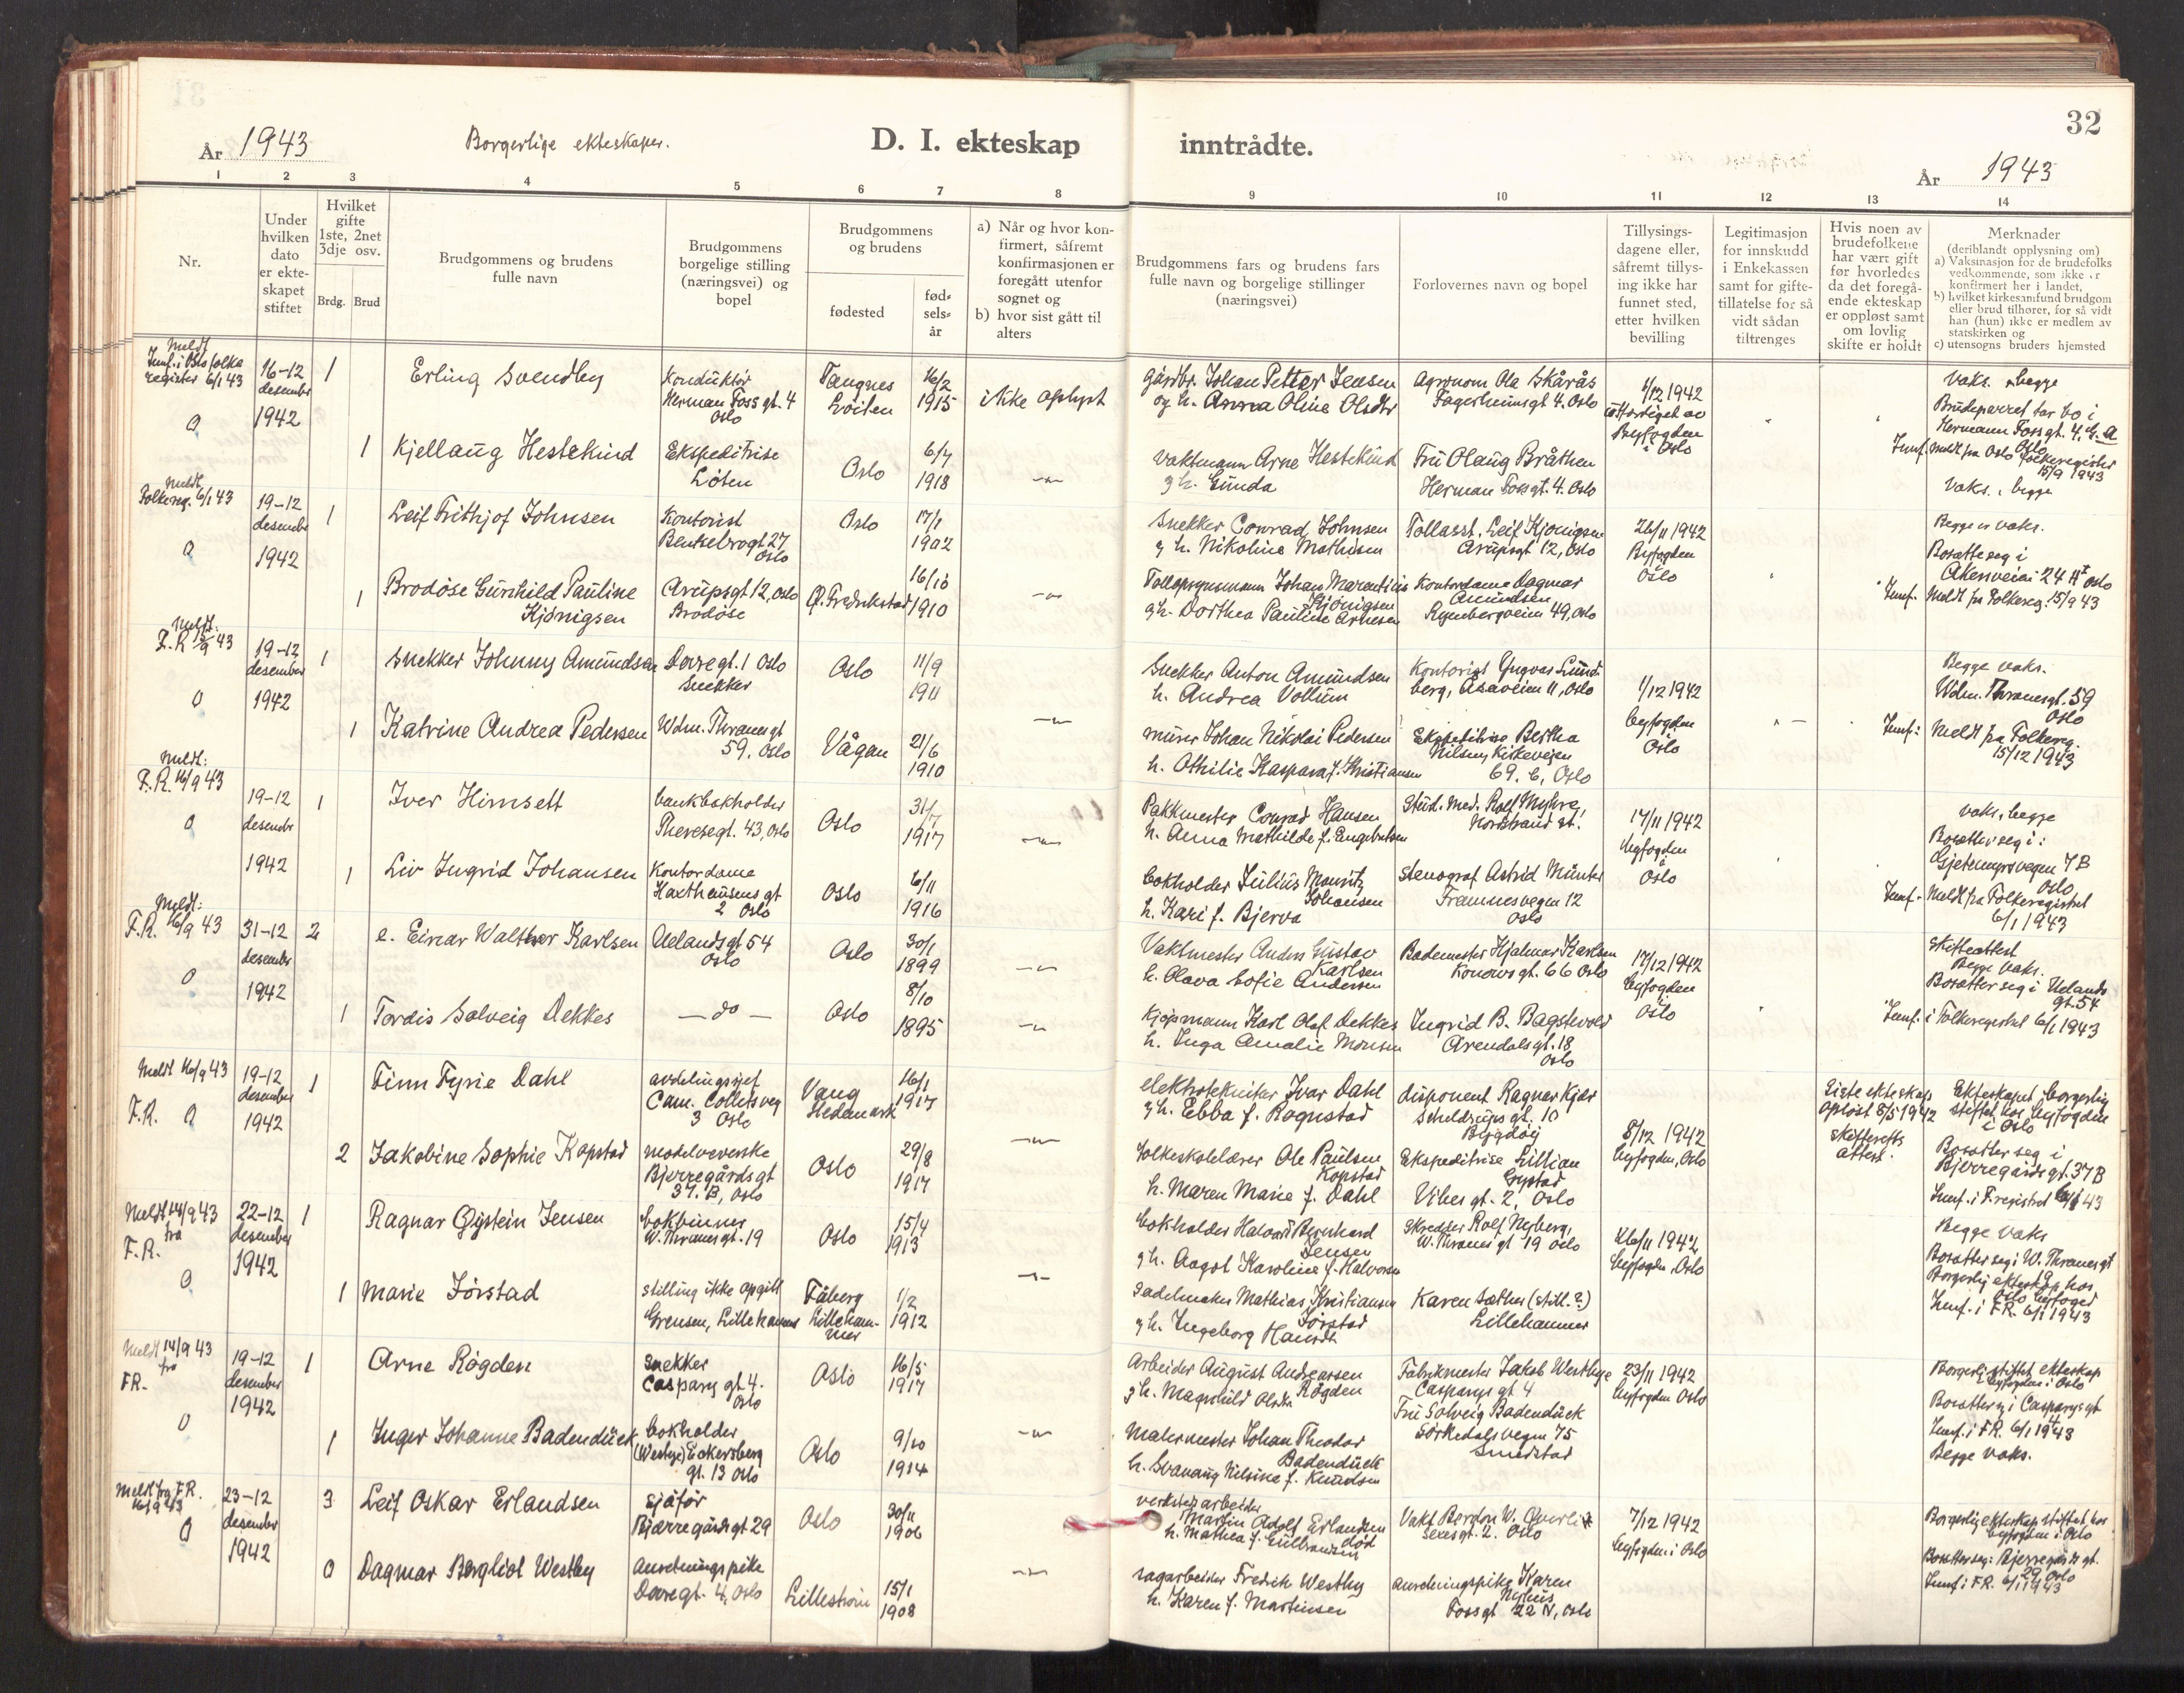 SAO, Gamle Aker prestekontor Kirkebøker, F/L0022: Parish register (official) no. 22, 1941-1952, p. 32